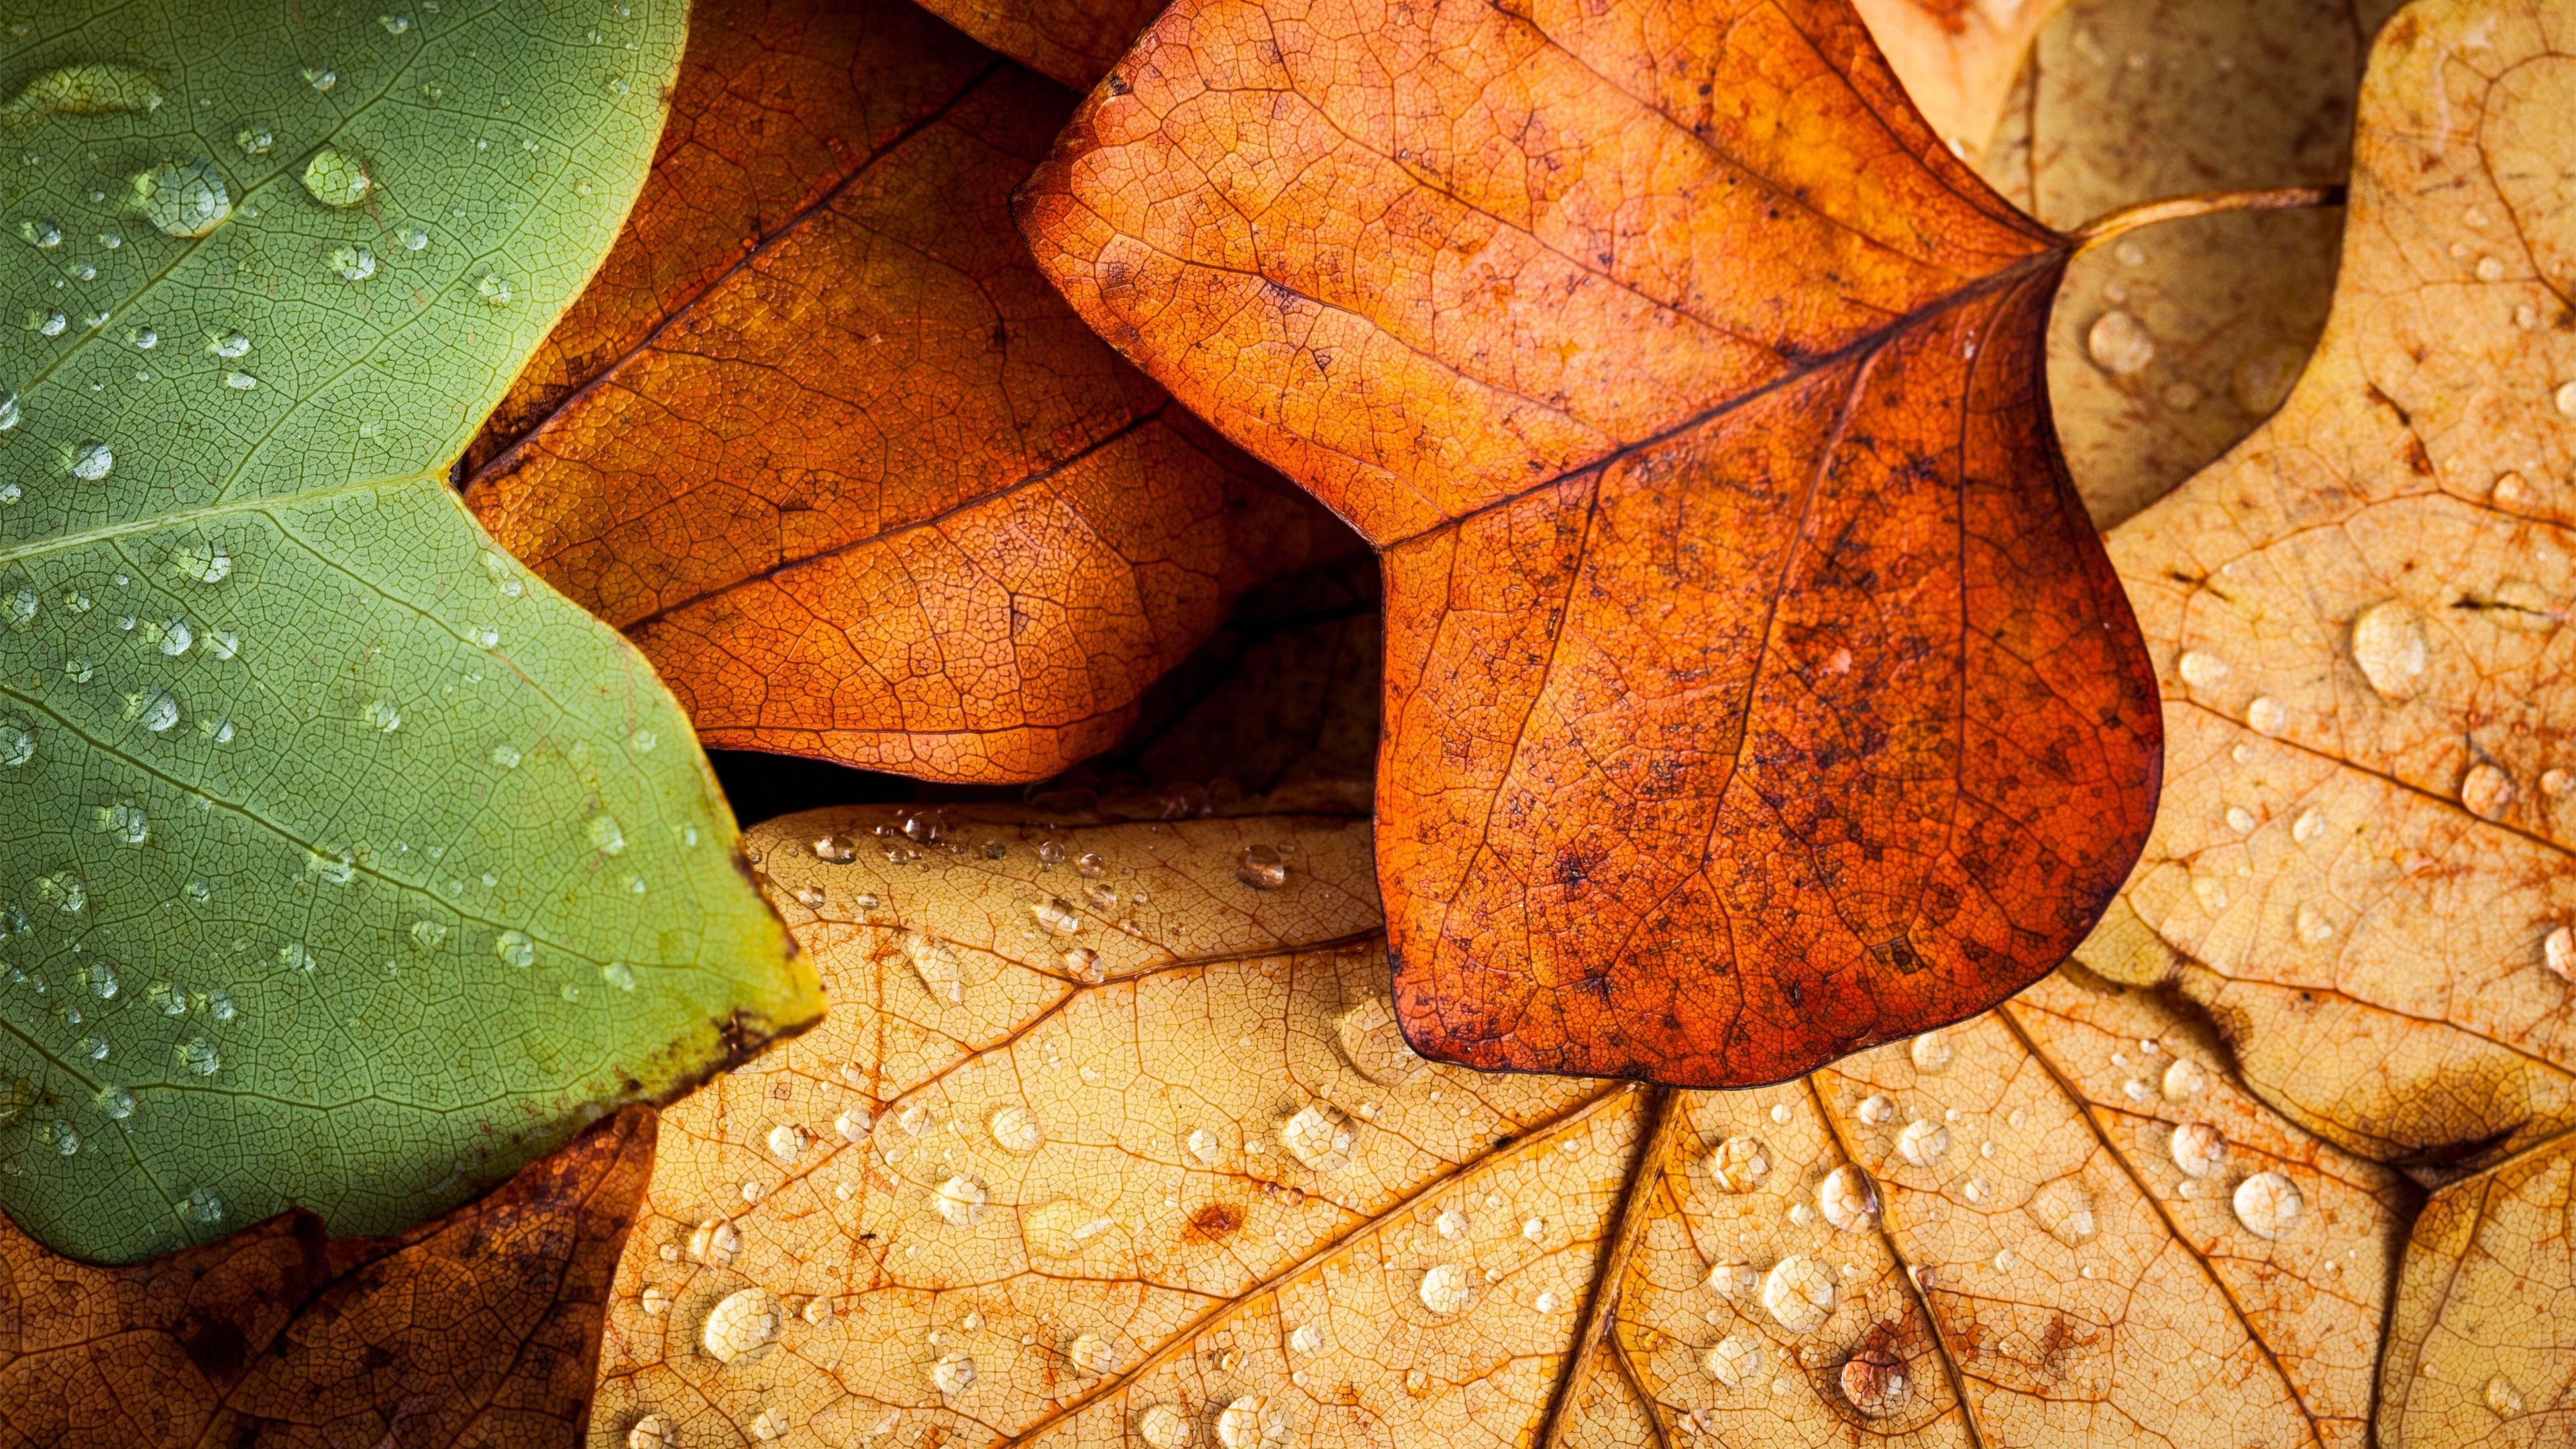 General 3840x2160 nature leaves closeup macro fall water drops wet